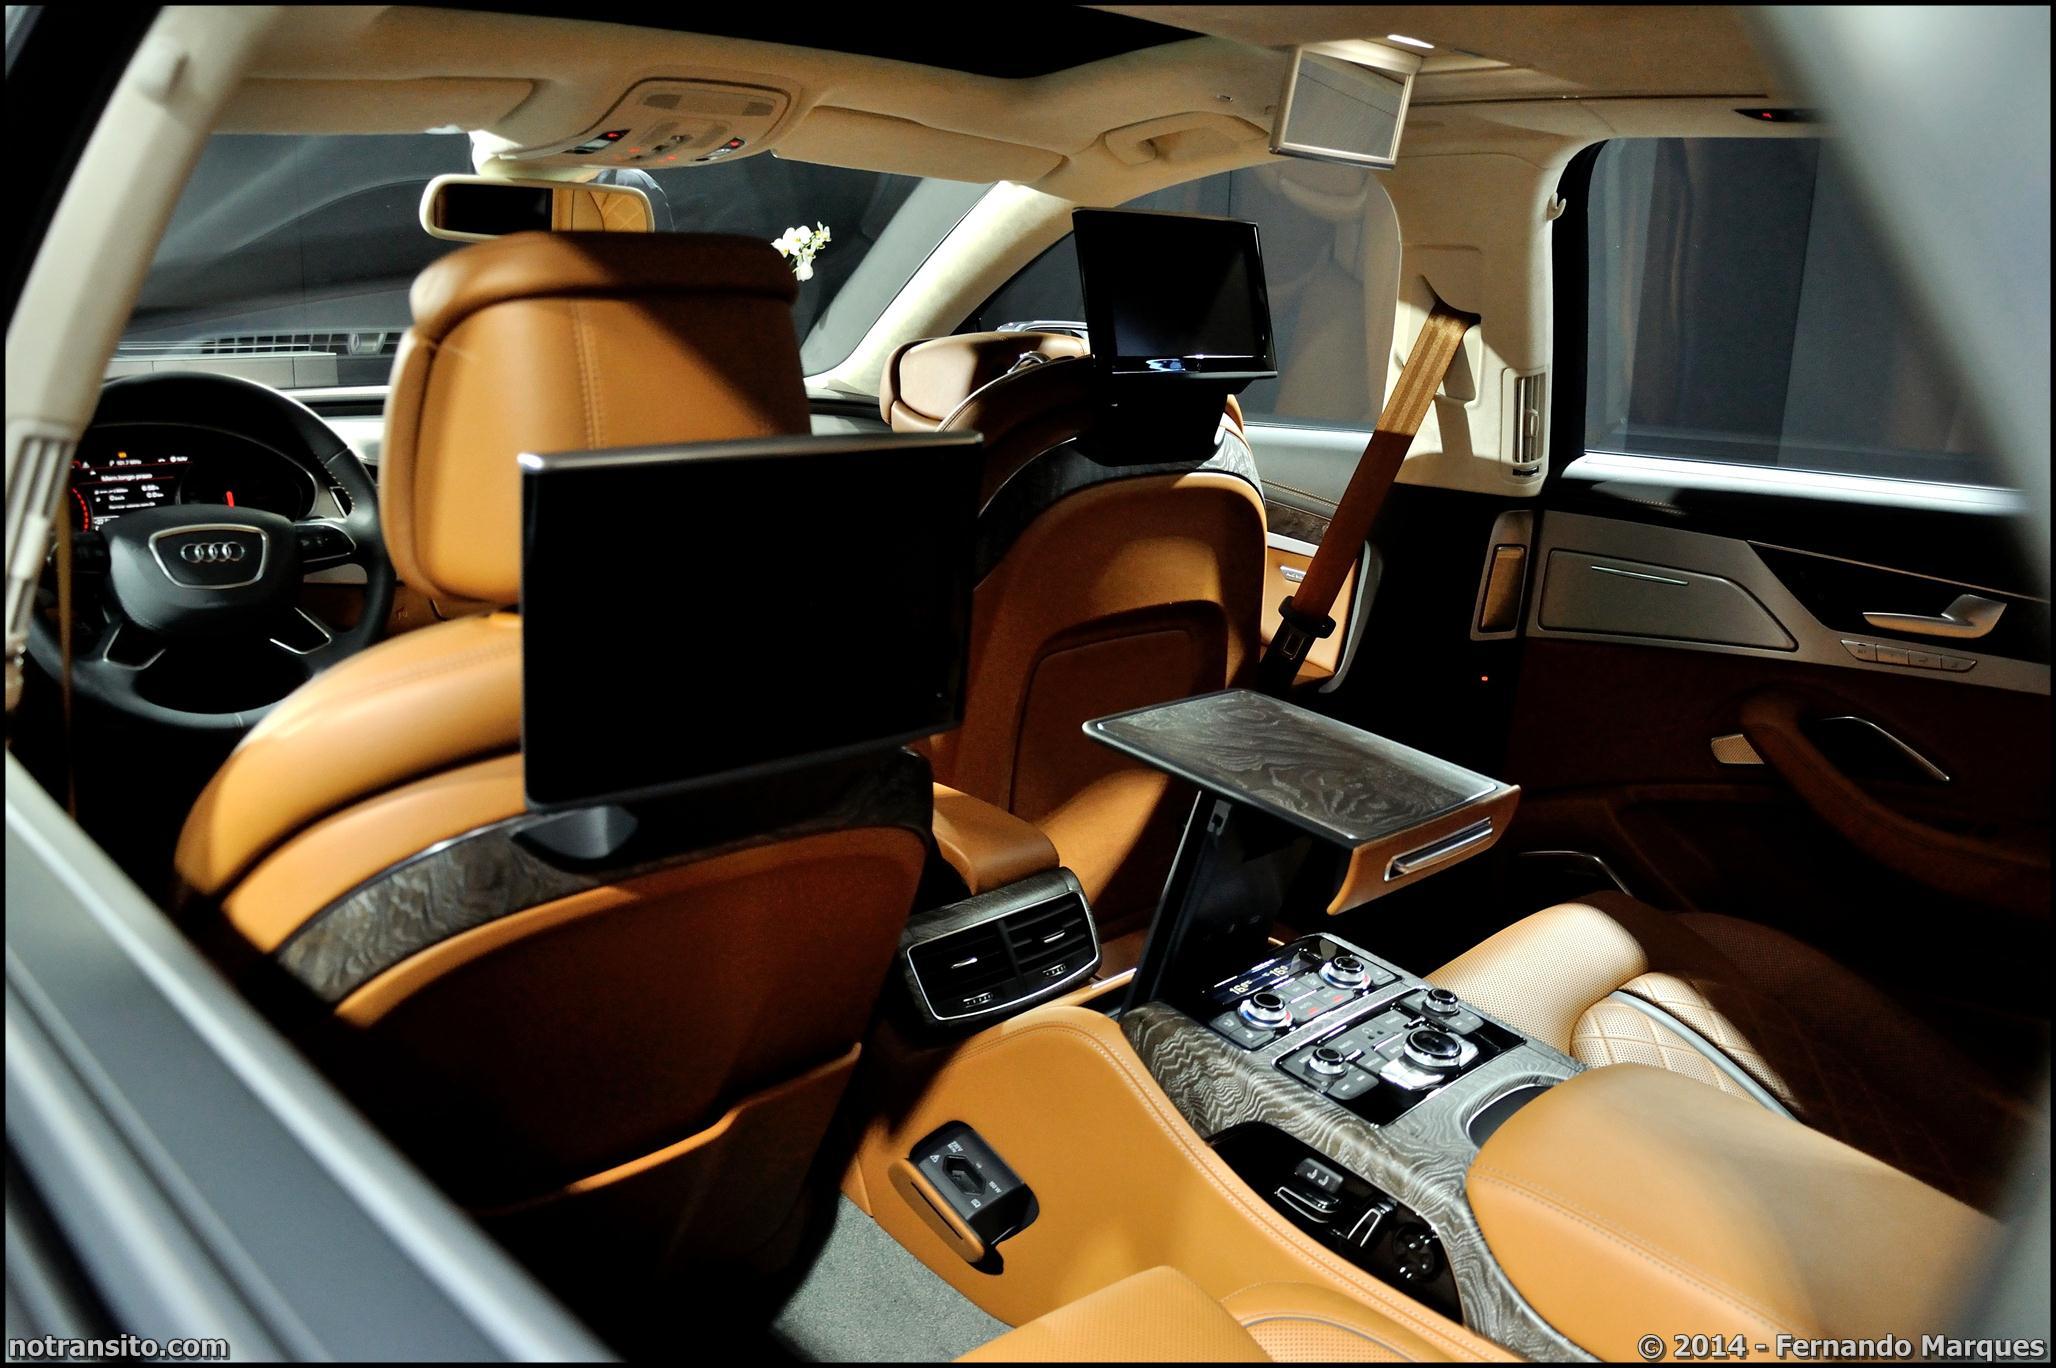 Audi A8 L W12 Exclusive Concept, Salão do Automóvel 2014, agatha cognac, poltrona frau